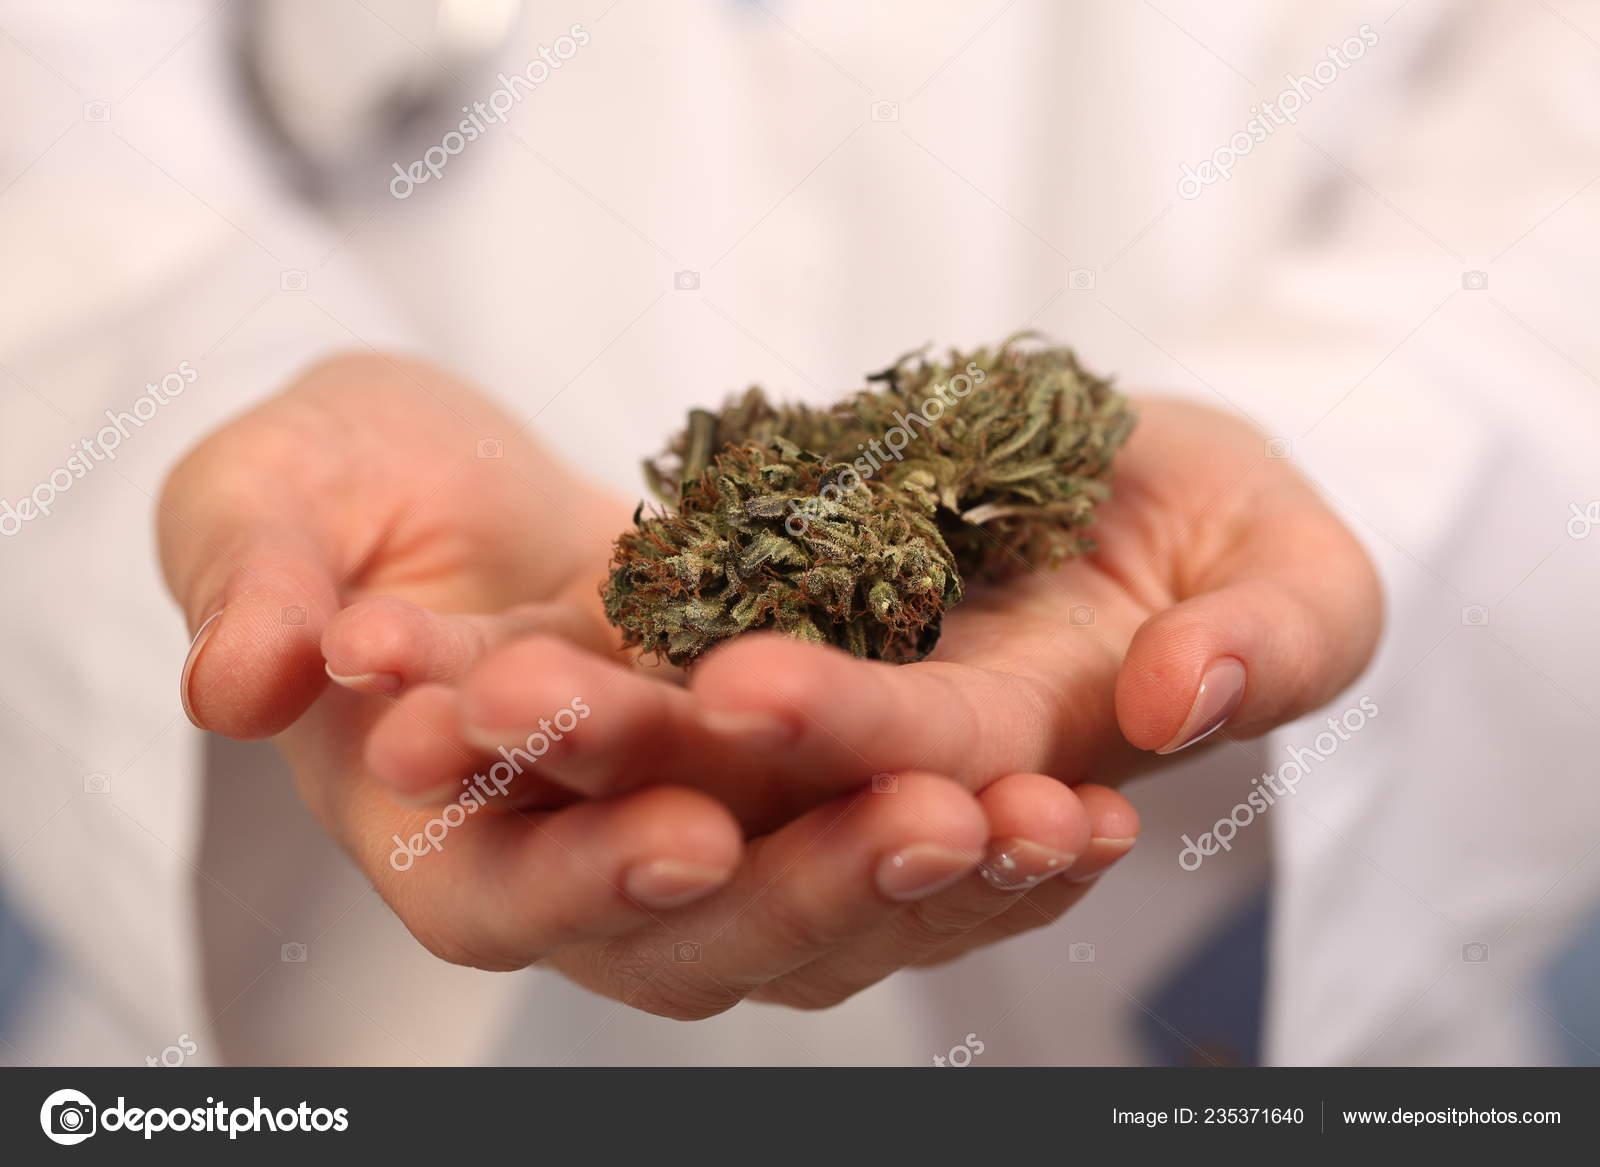 Medical Marijuana Hand Doctor Cannabis Alternative Medicine